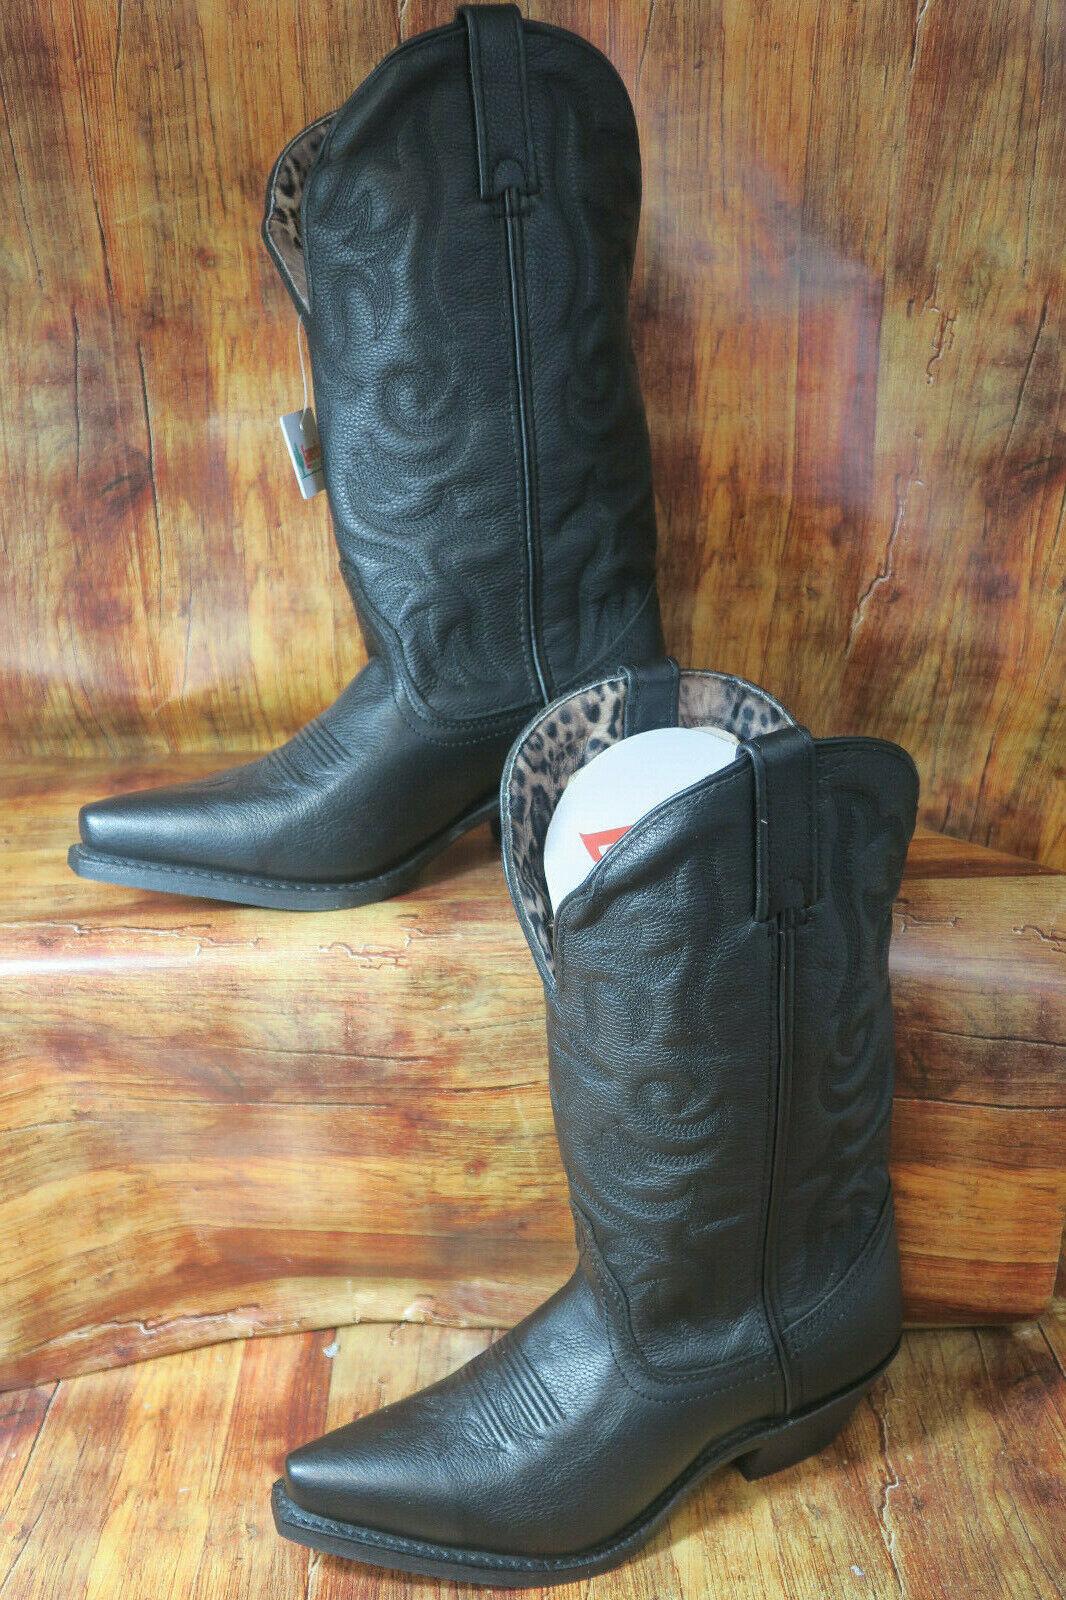 51070 Laredo Women's 9 Access Western Western Western Cowgirl Boots Black Deep Dip  1303 c75e77